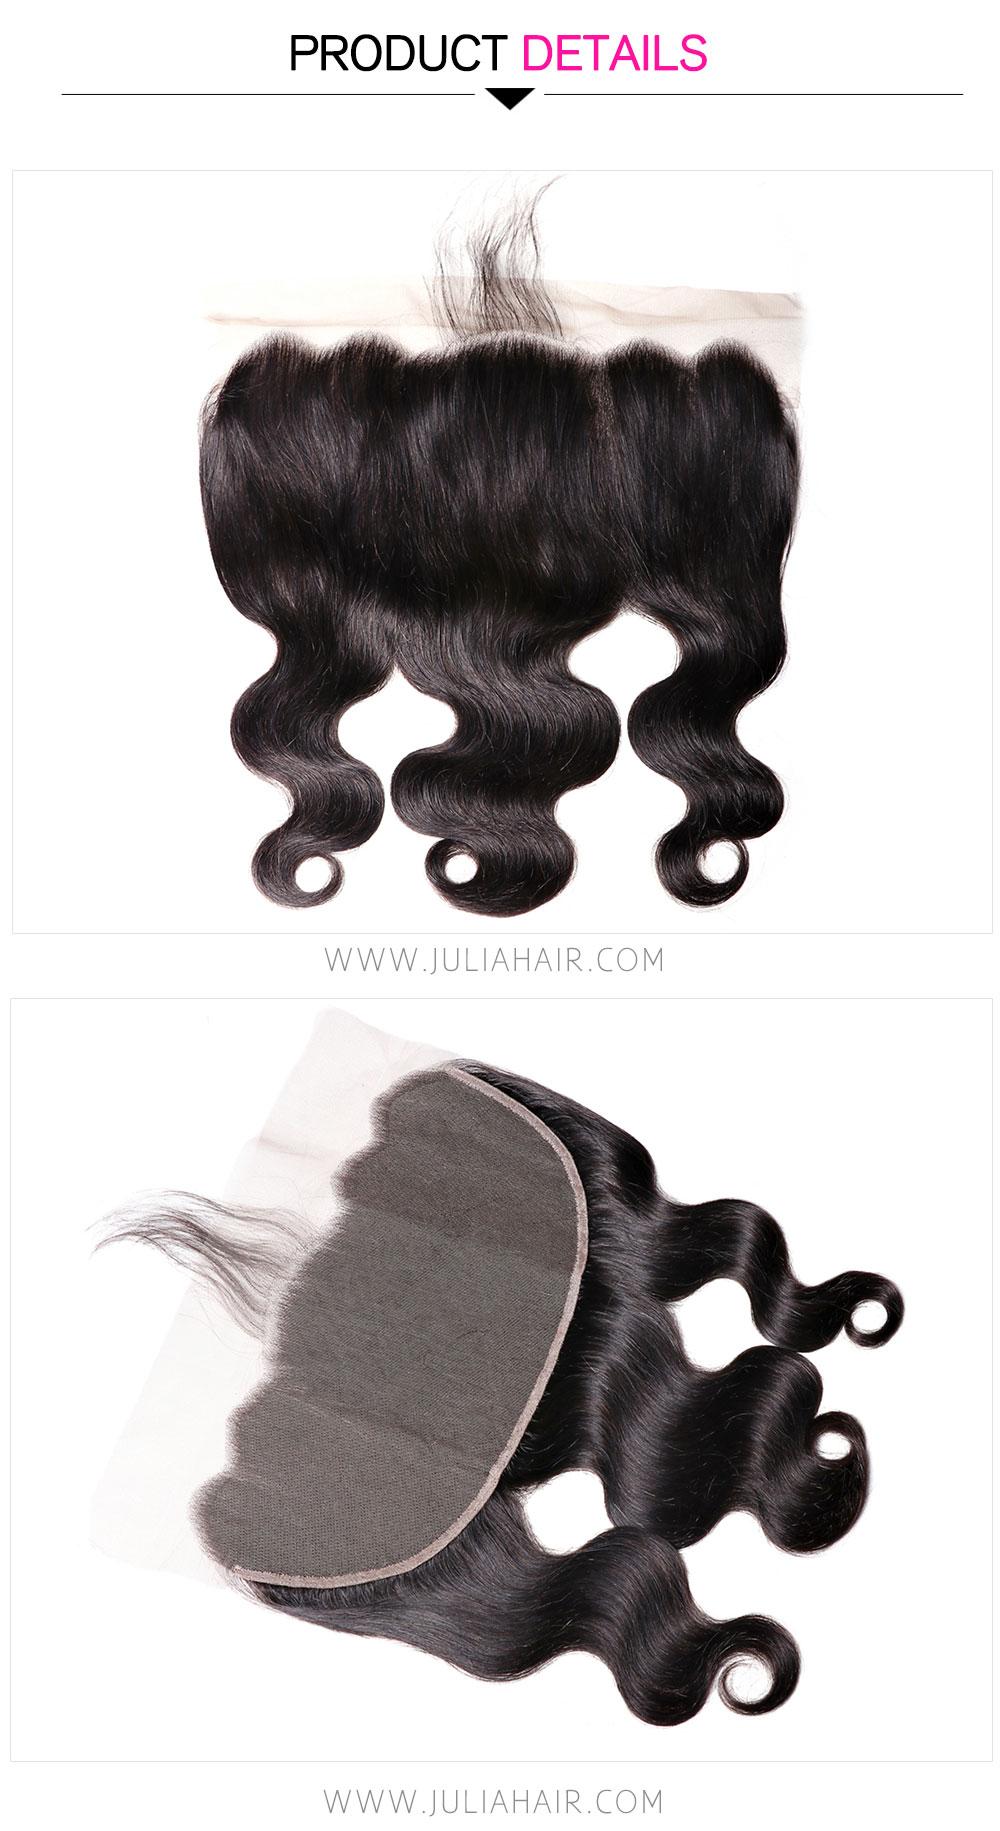 Brazilian hair 13x6 lace frontal